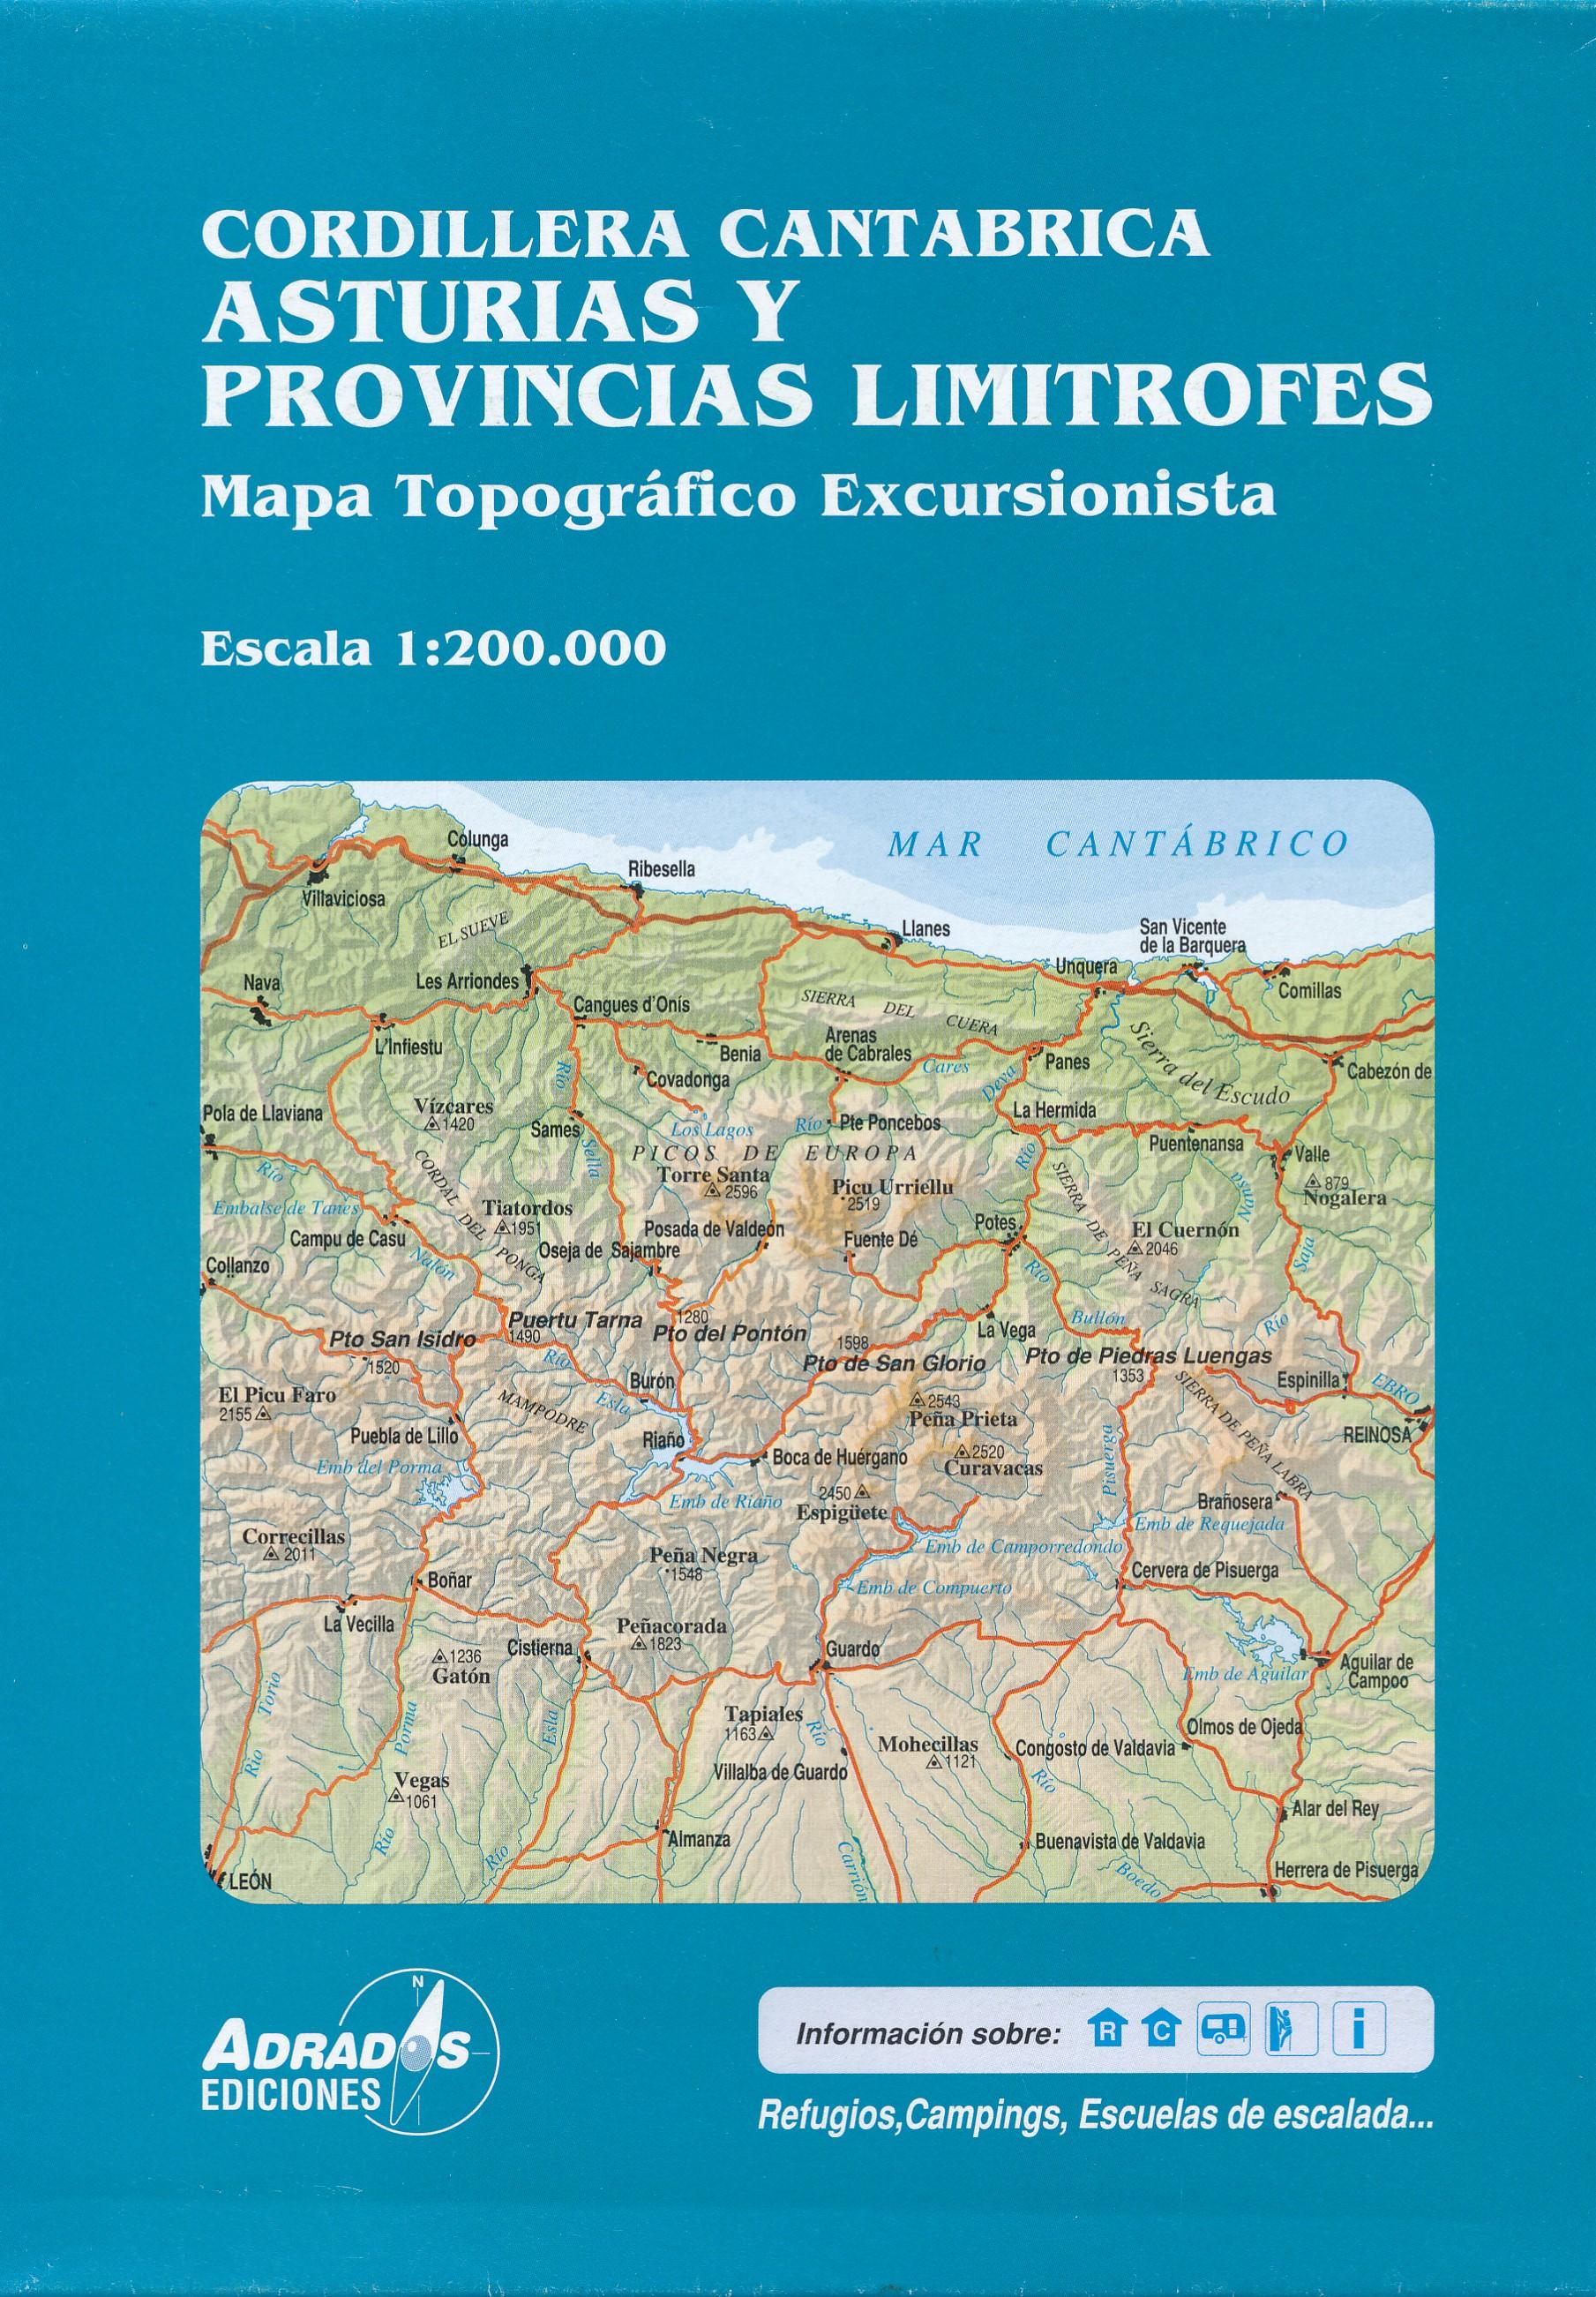 Cordillera Cantabrica 1:200.000 9788494080739  Adrados   Landkaarten en wegenkaarten Noordwest-Spanje